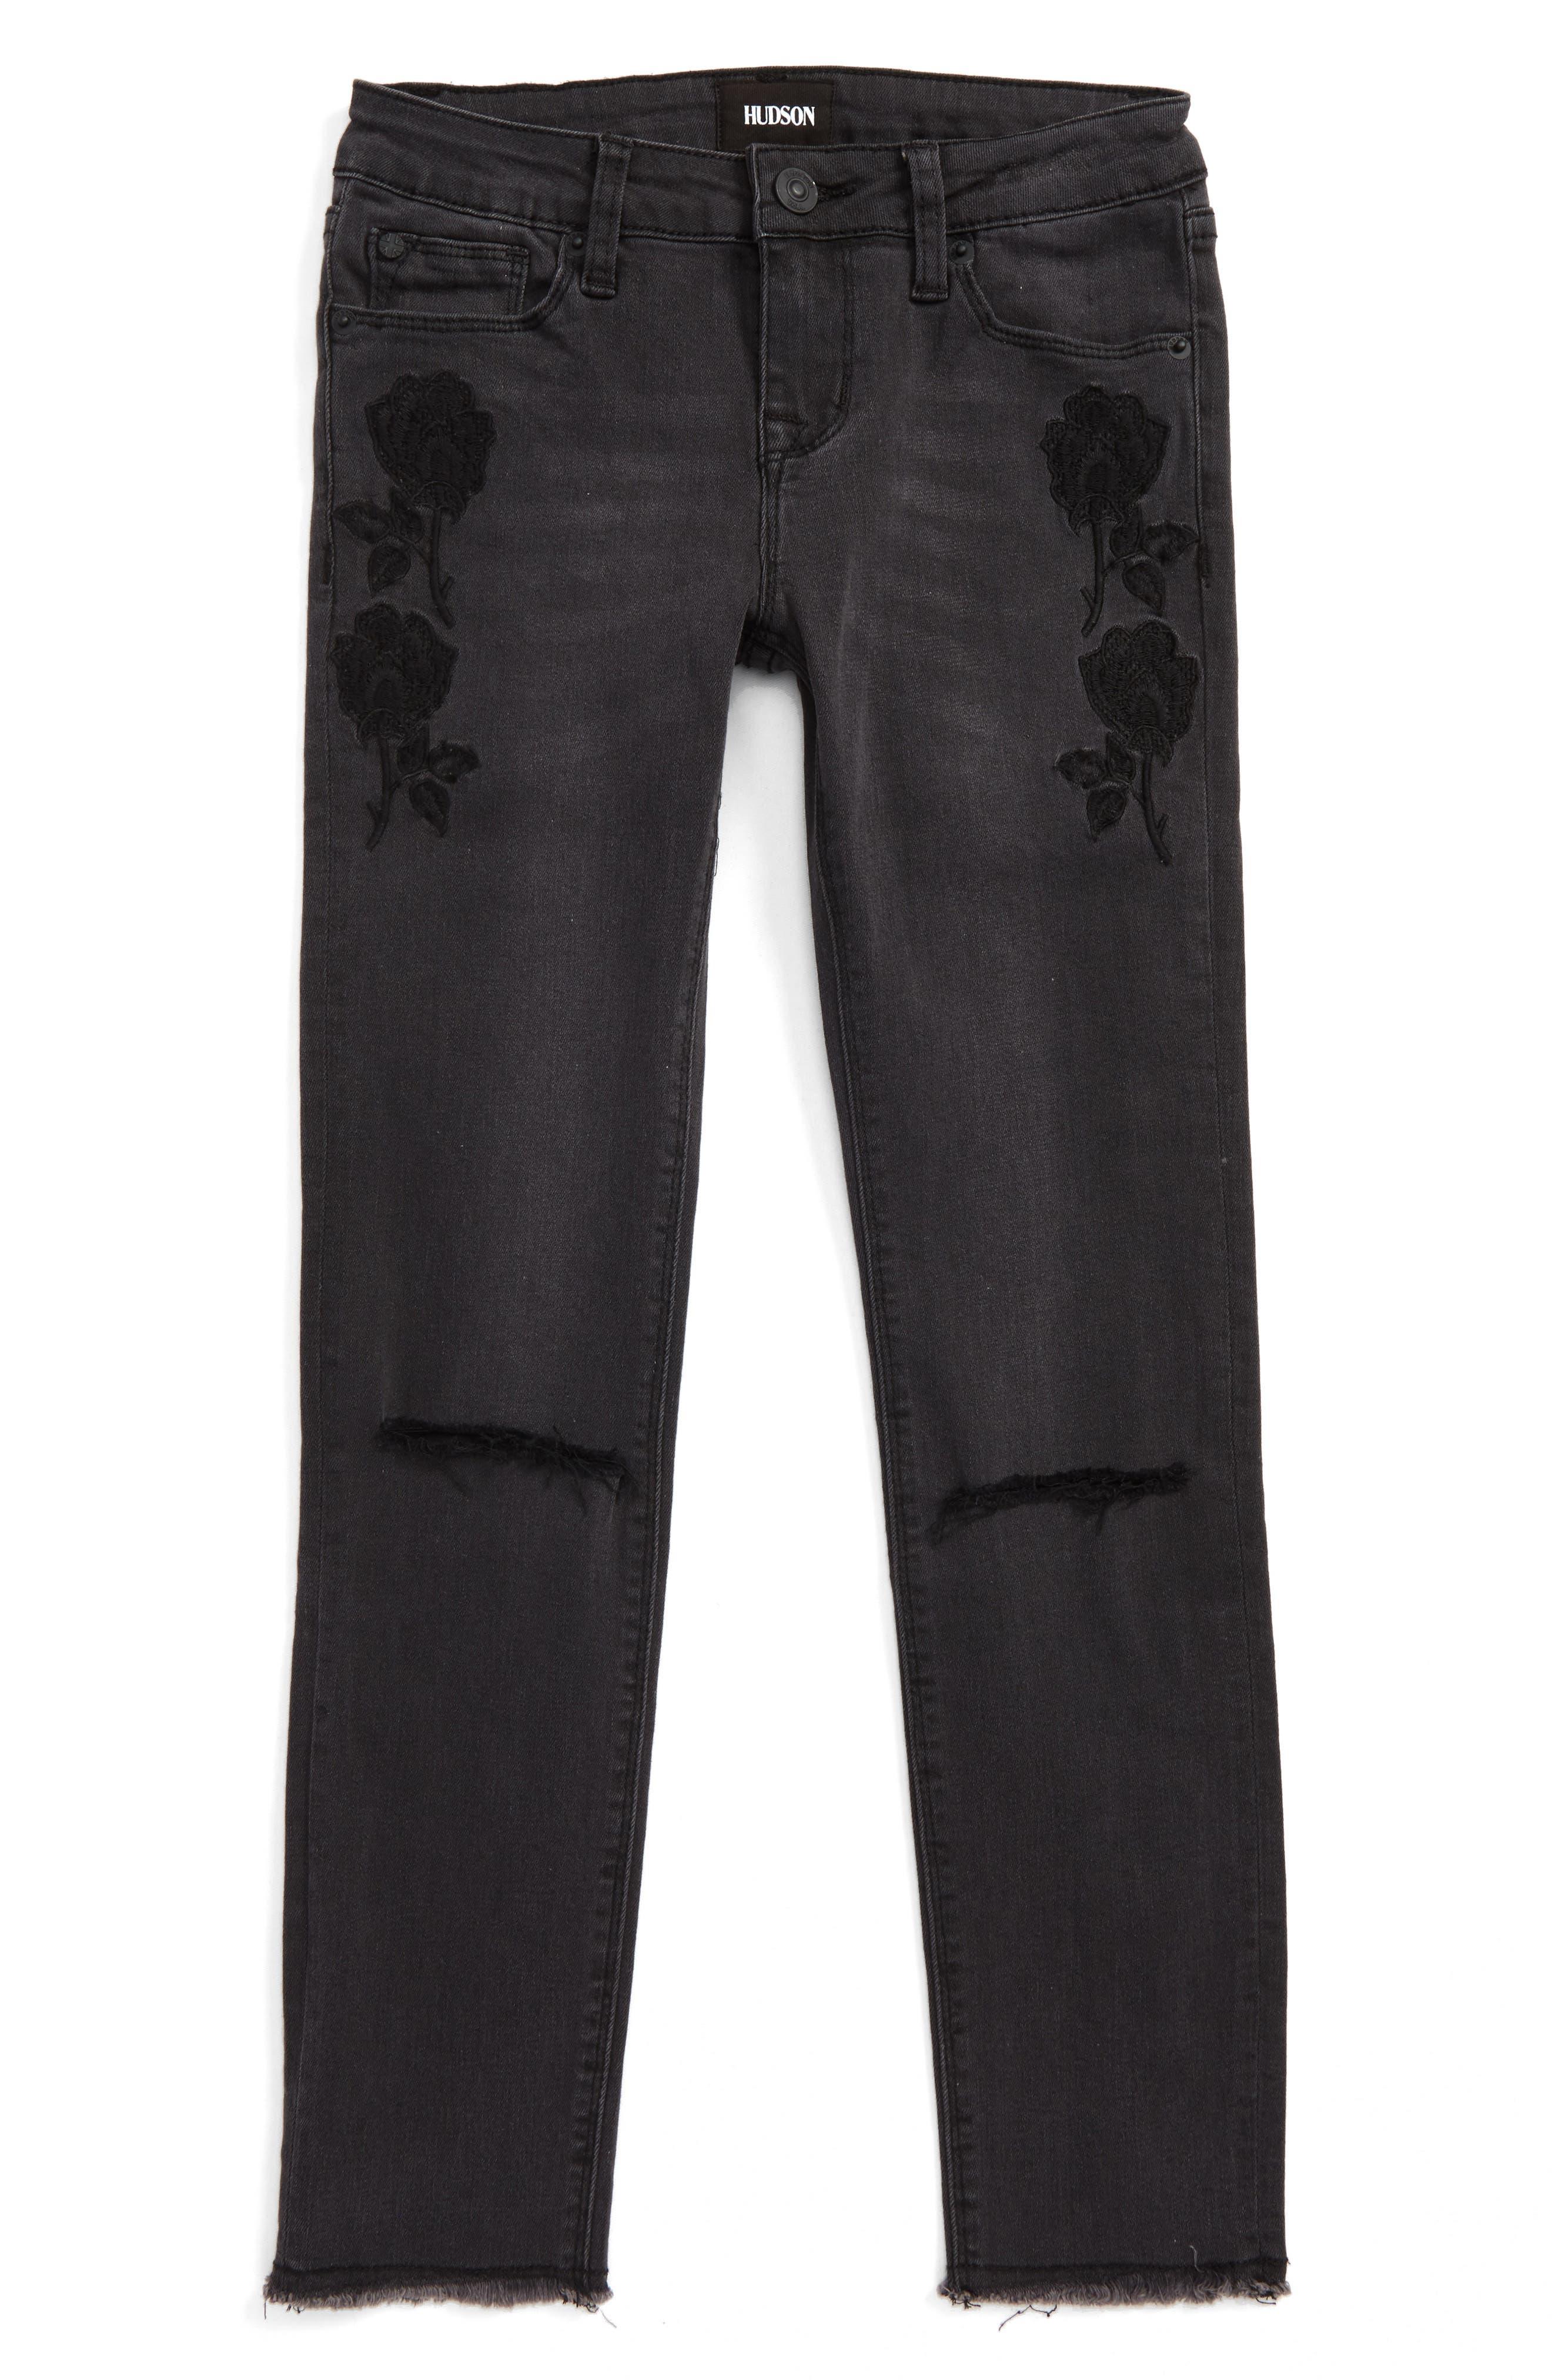 Black Iris Skinny Jeans,                         Main,                         color, Black Ink